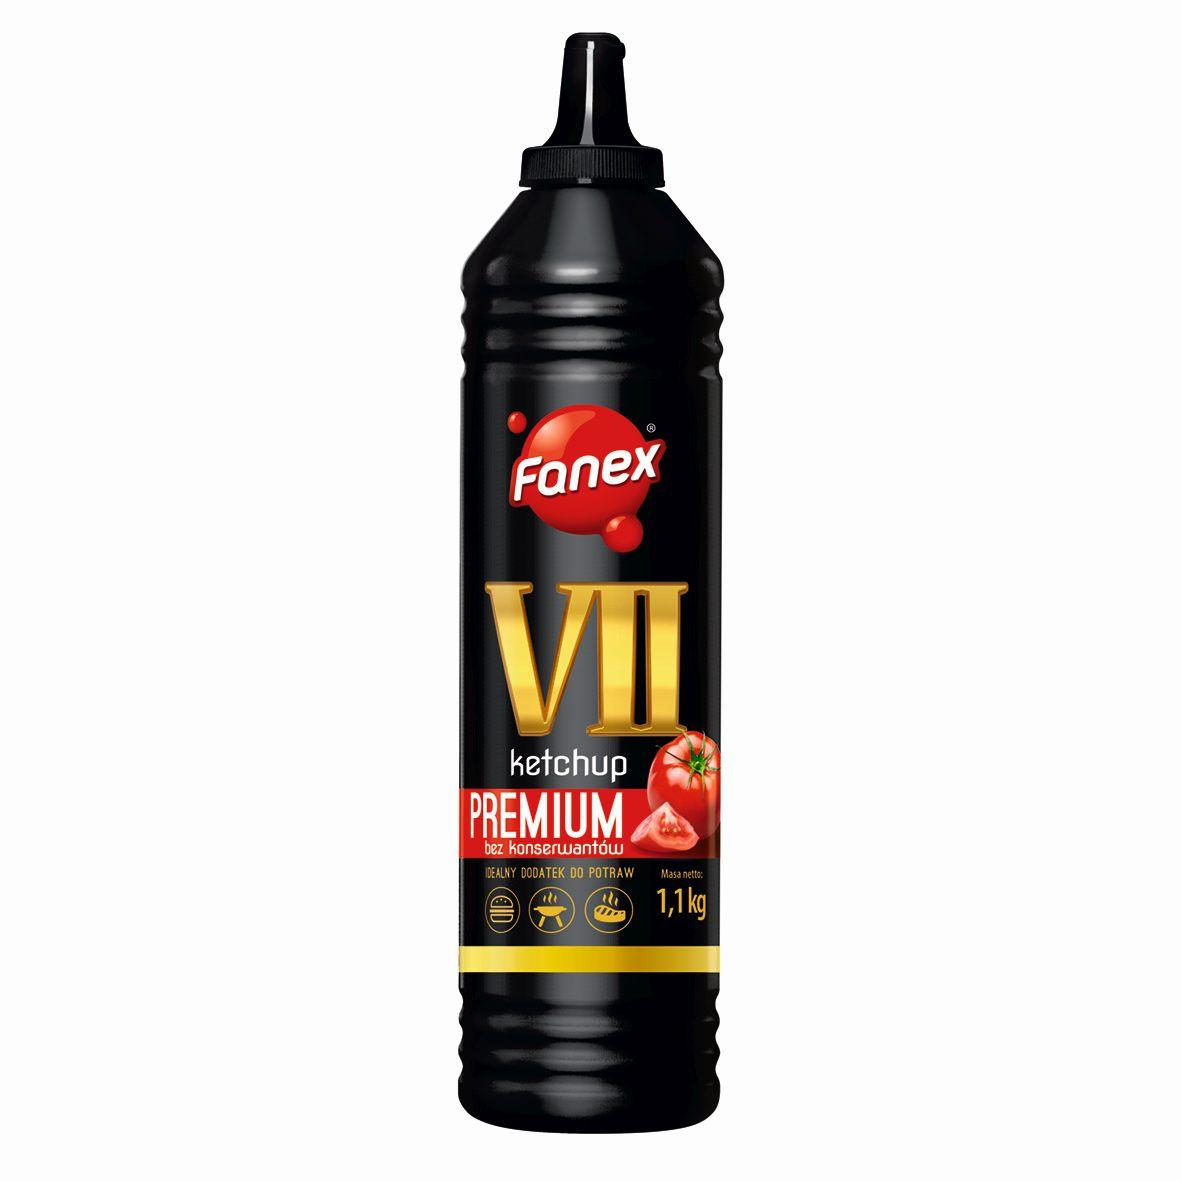 [SF] Кетчуп Vii 7 Premium 1100g Fanex